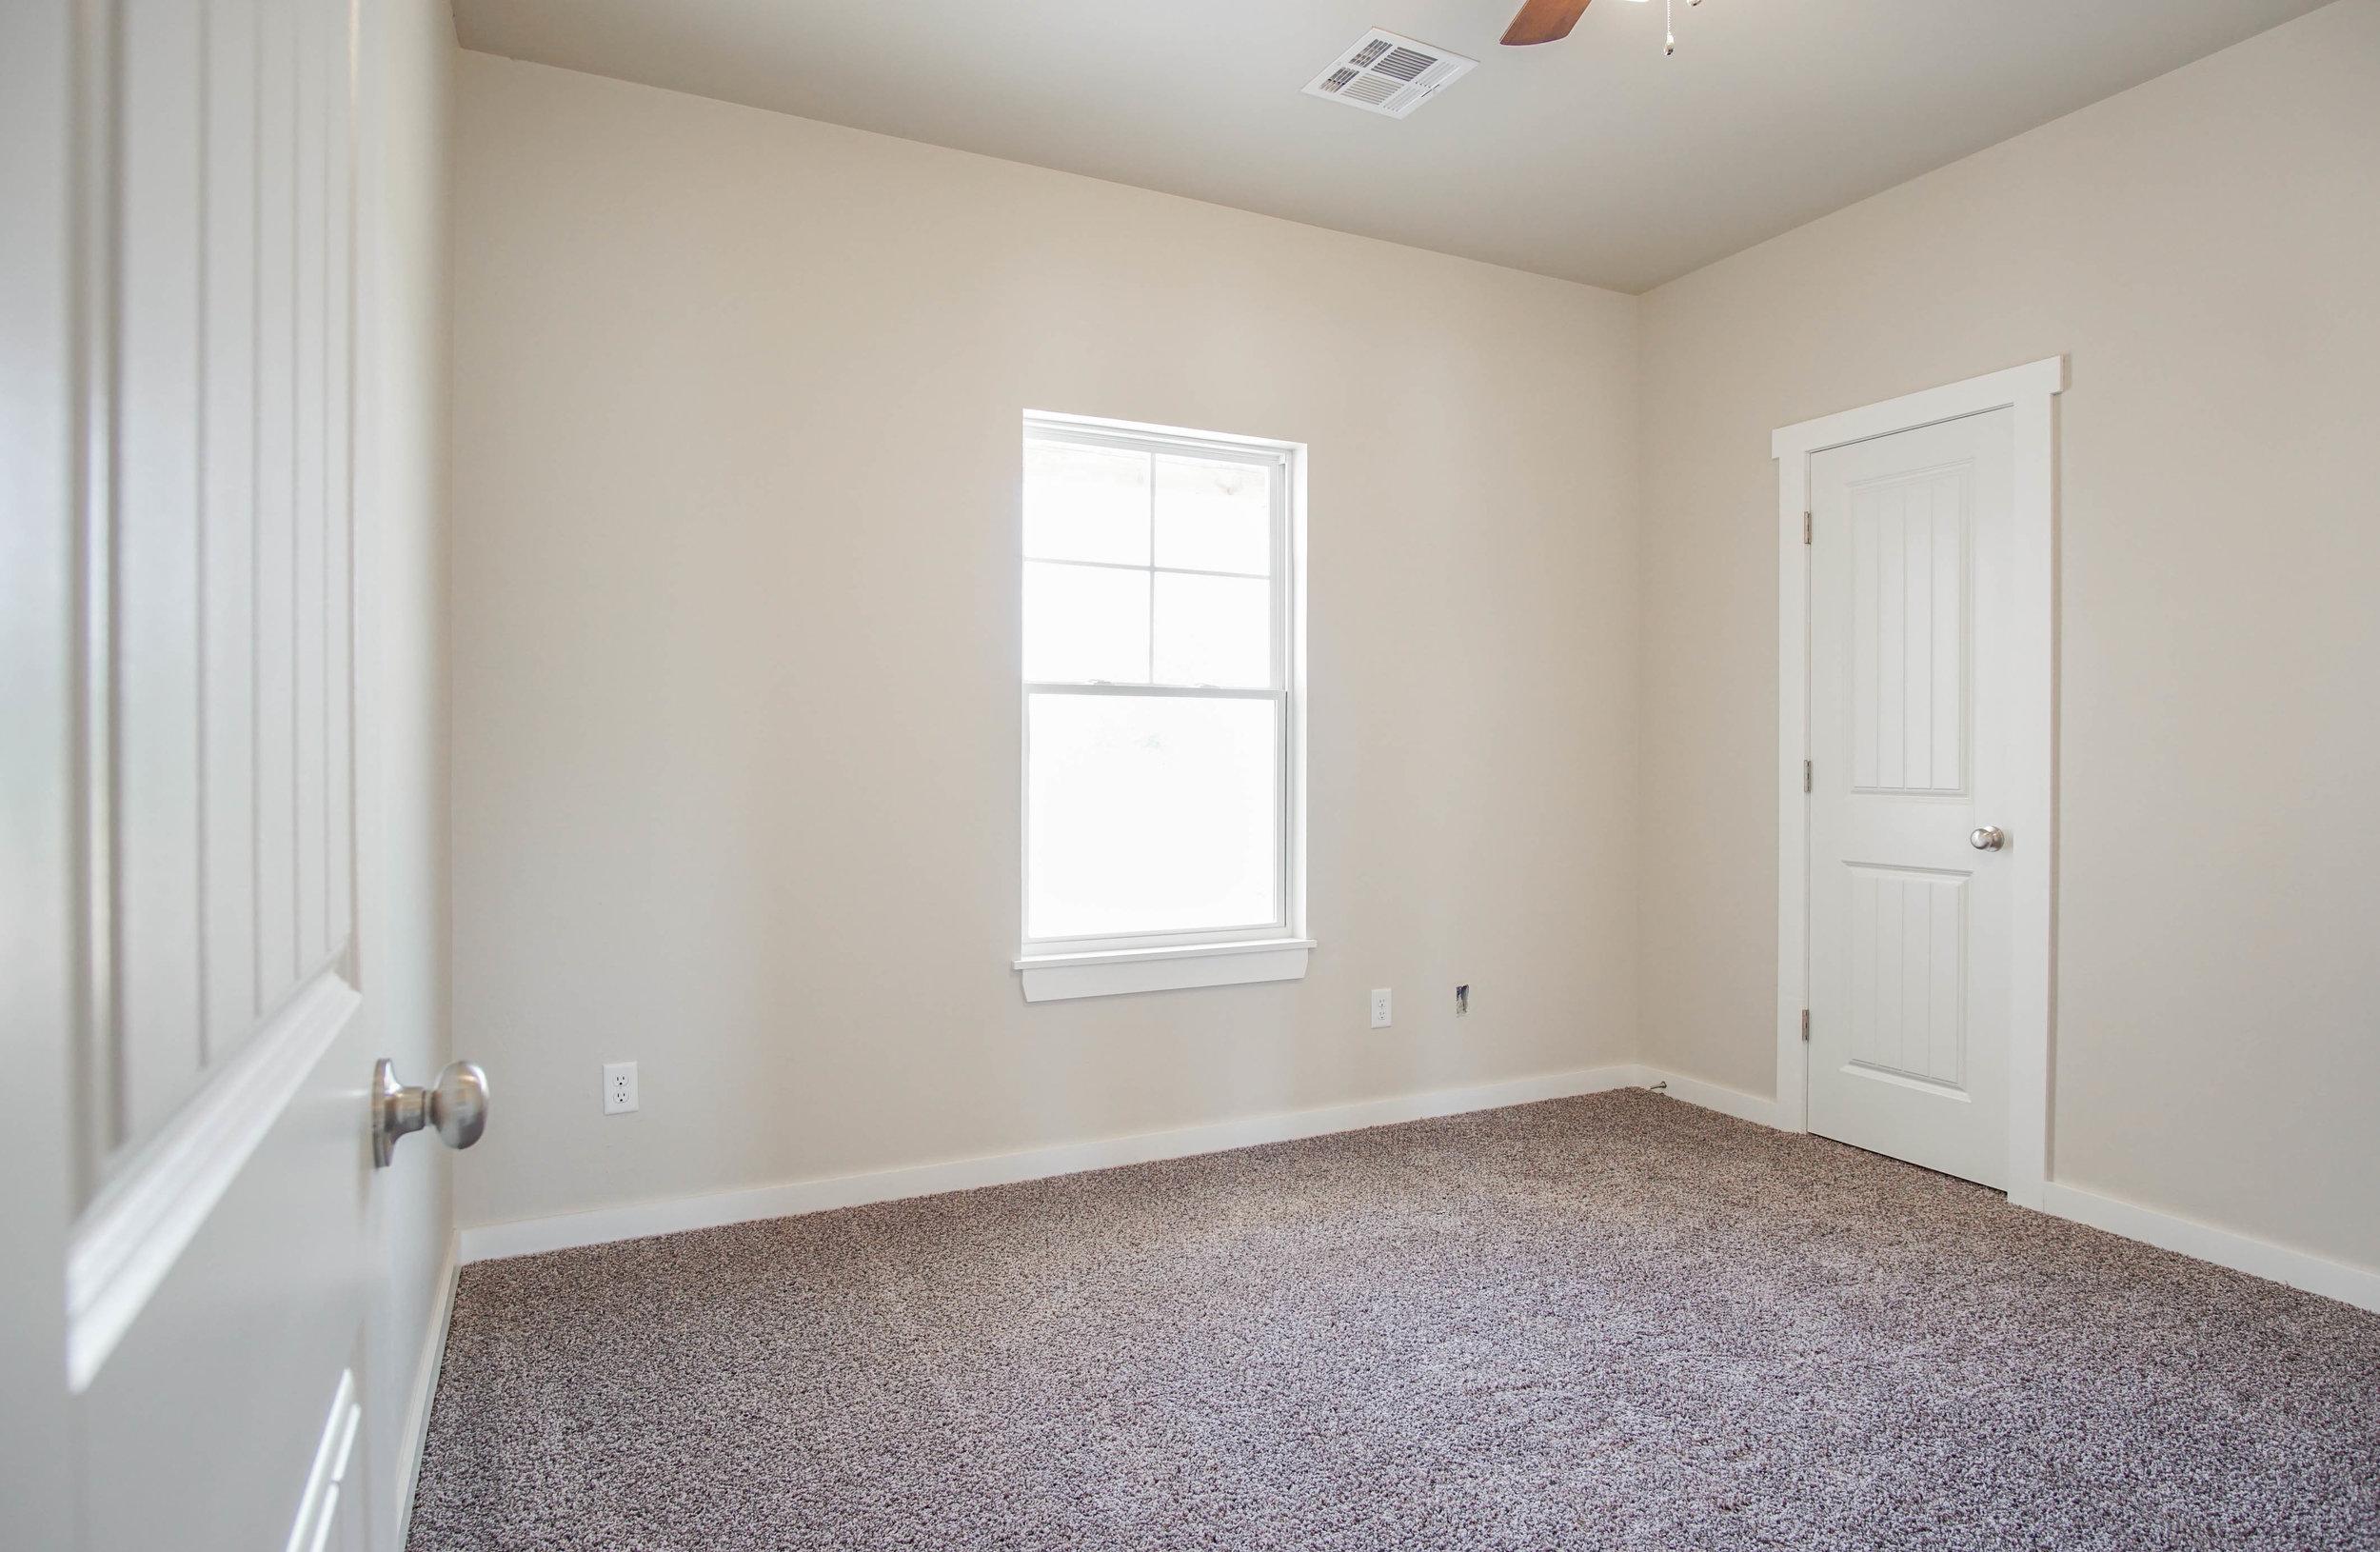 48 Bedroom 2.jpg